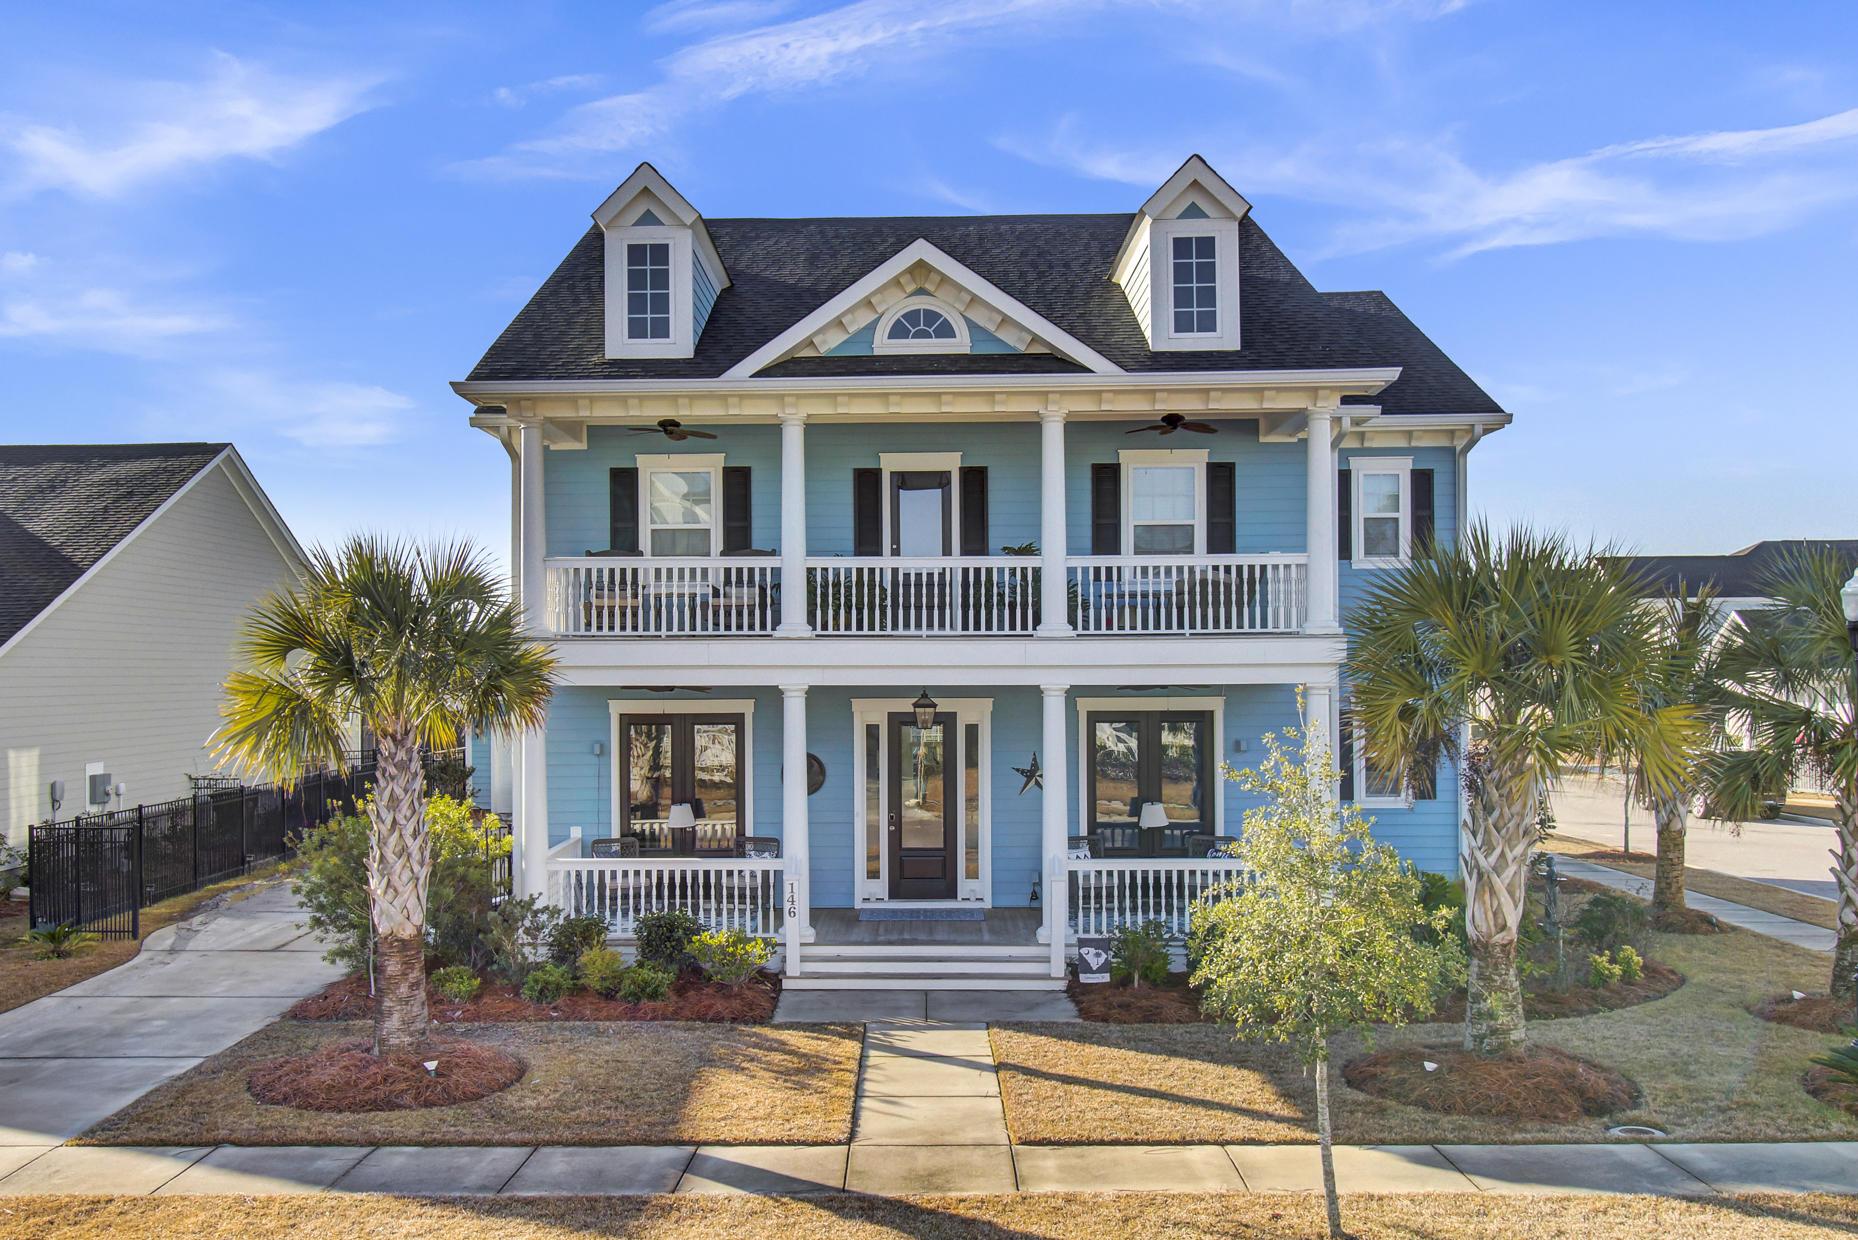 Carnes Crossroads Homes For Sale - 146 Callibluff, Summerville, SC - 12